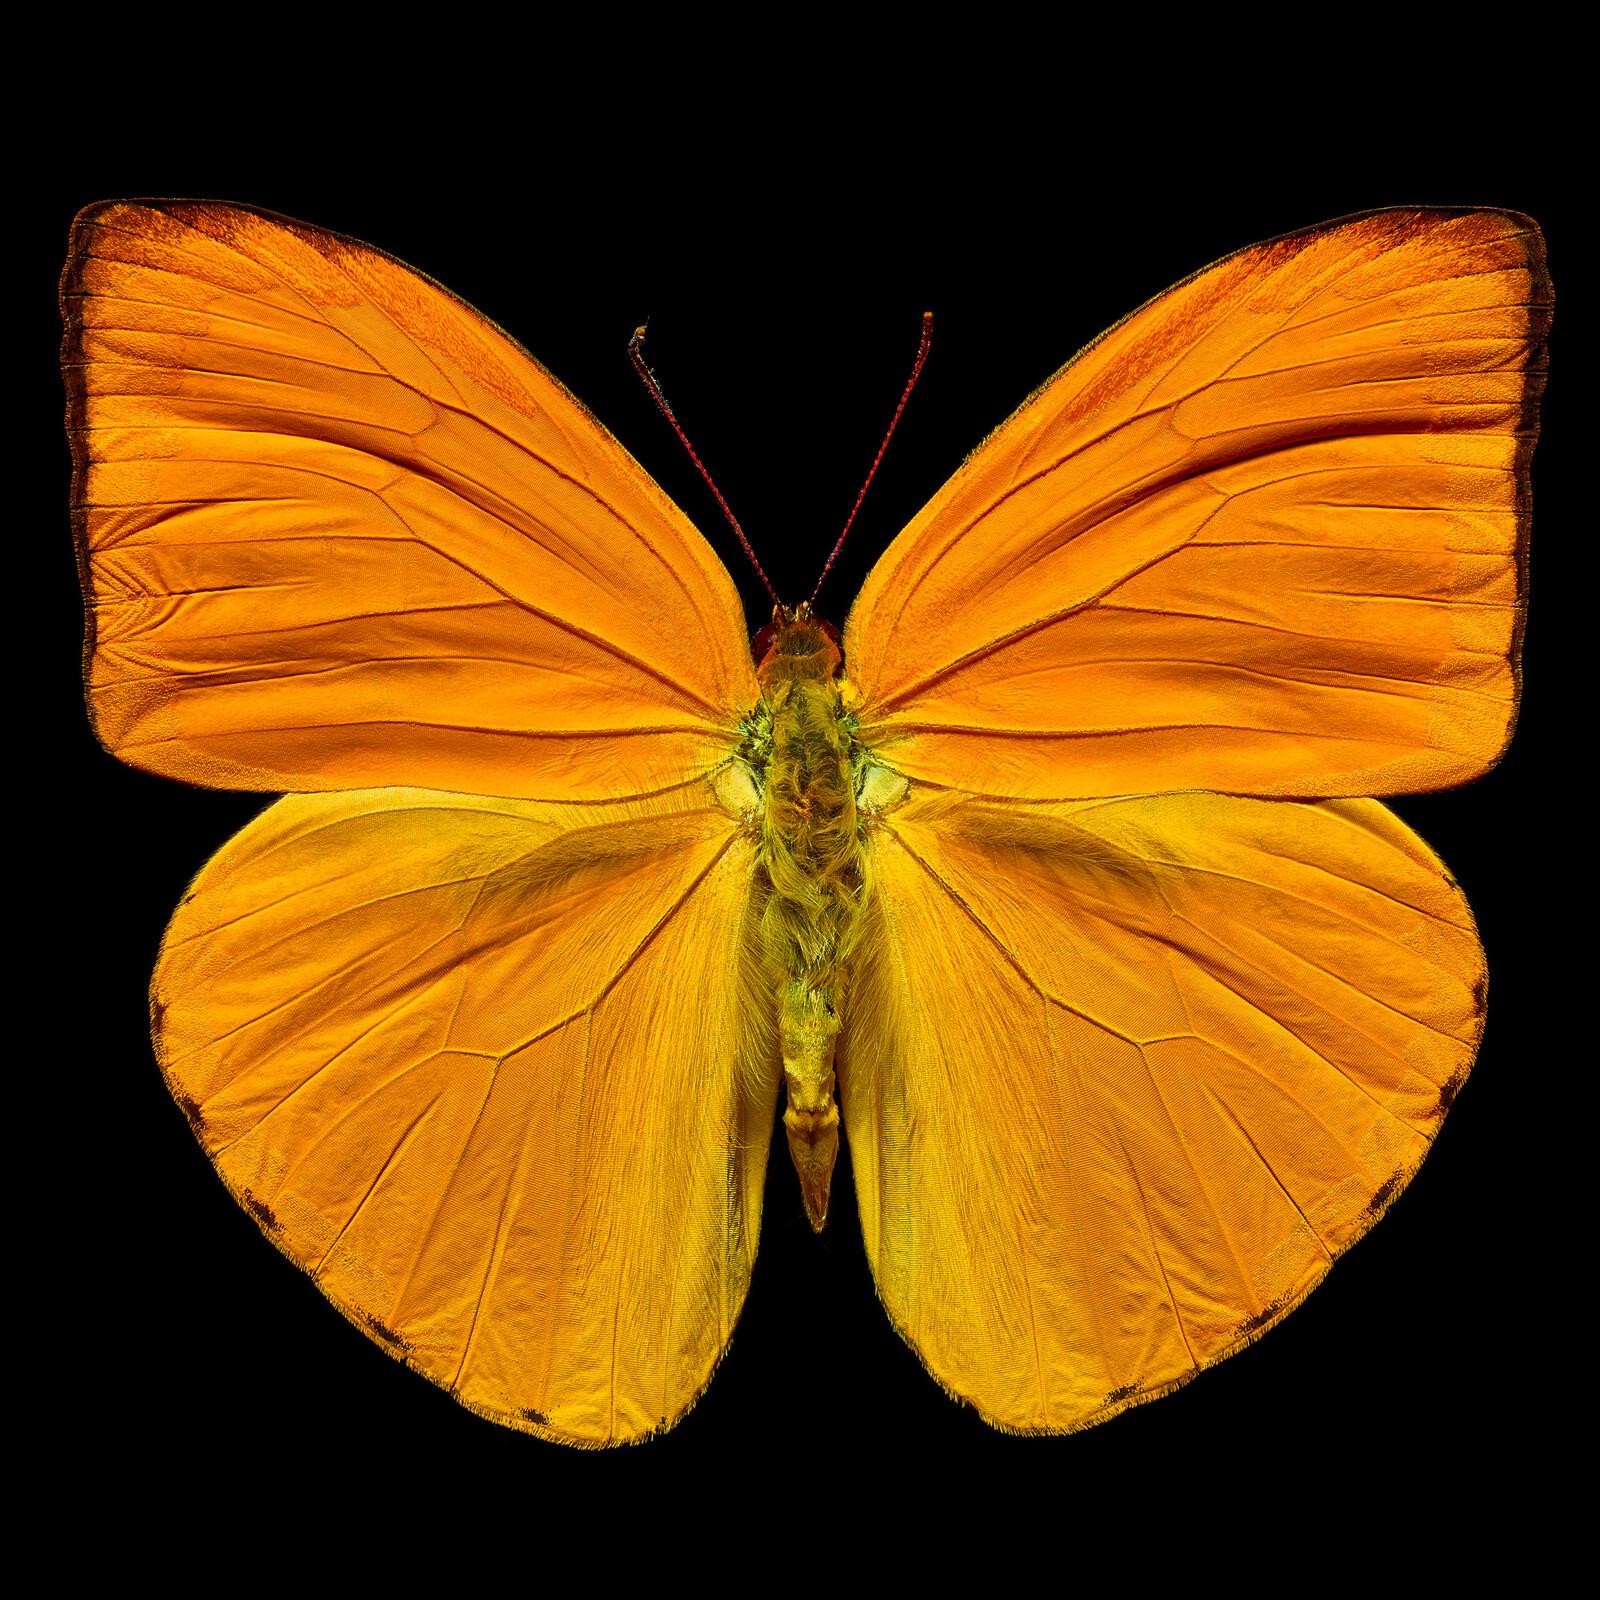 Butterfly IV - Heiko Hellwig